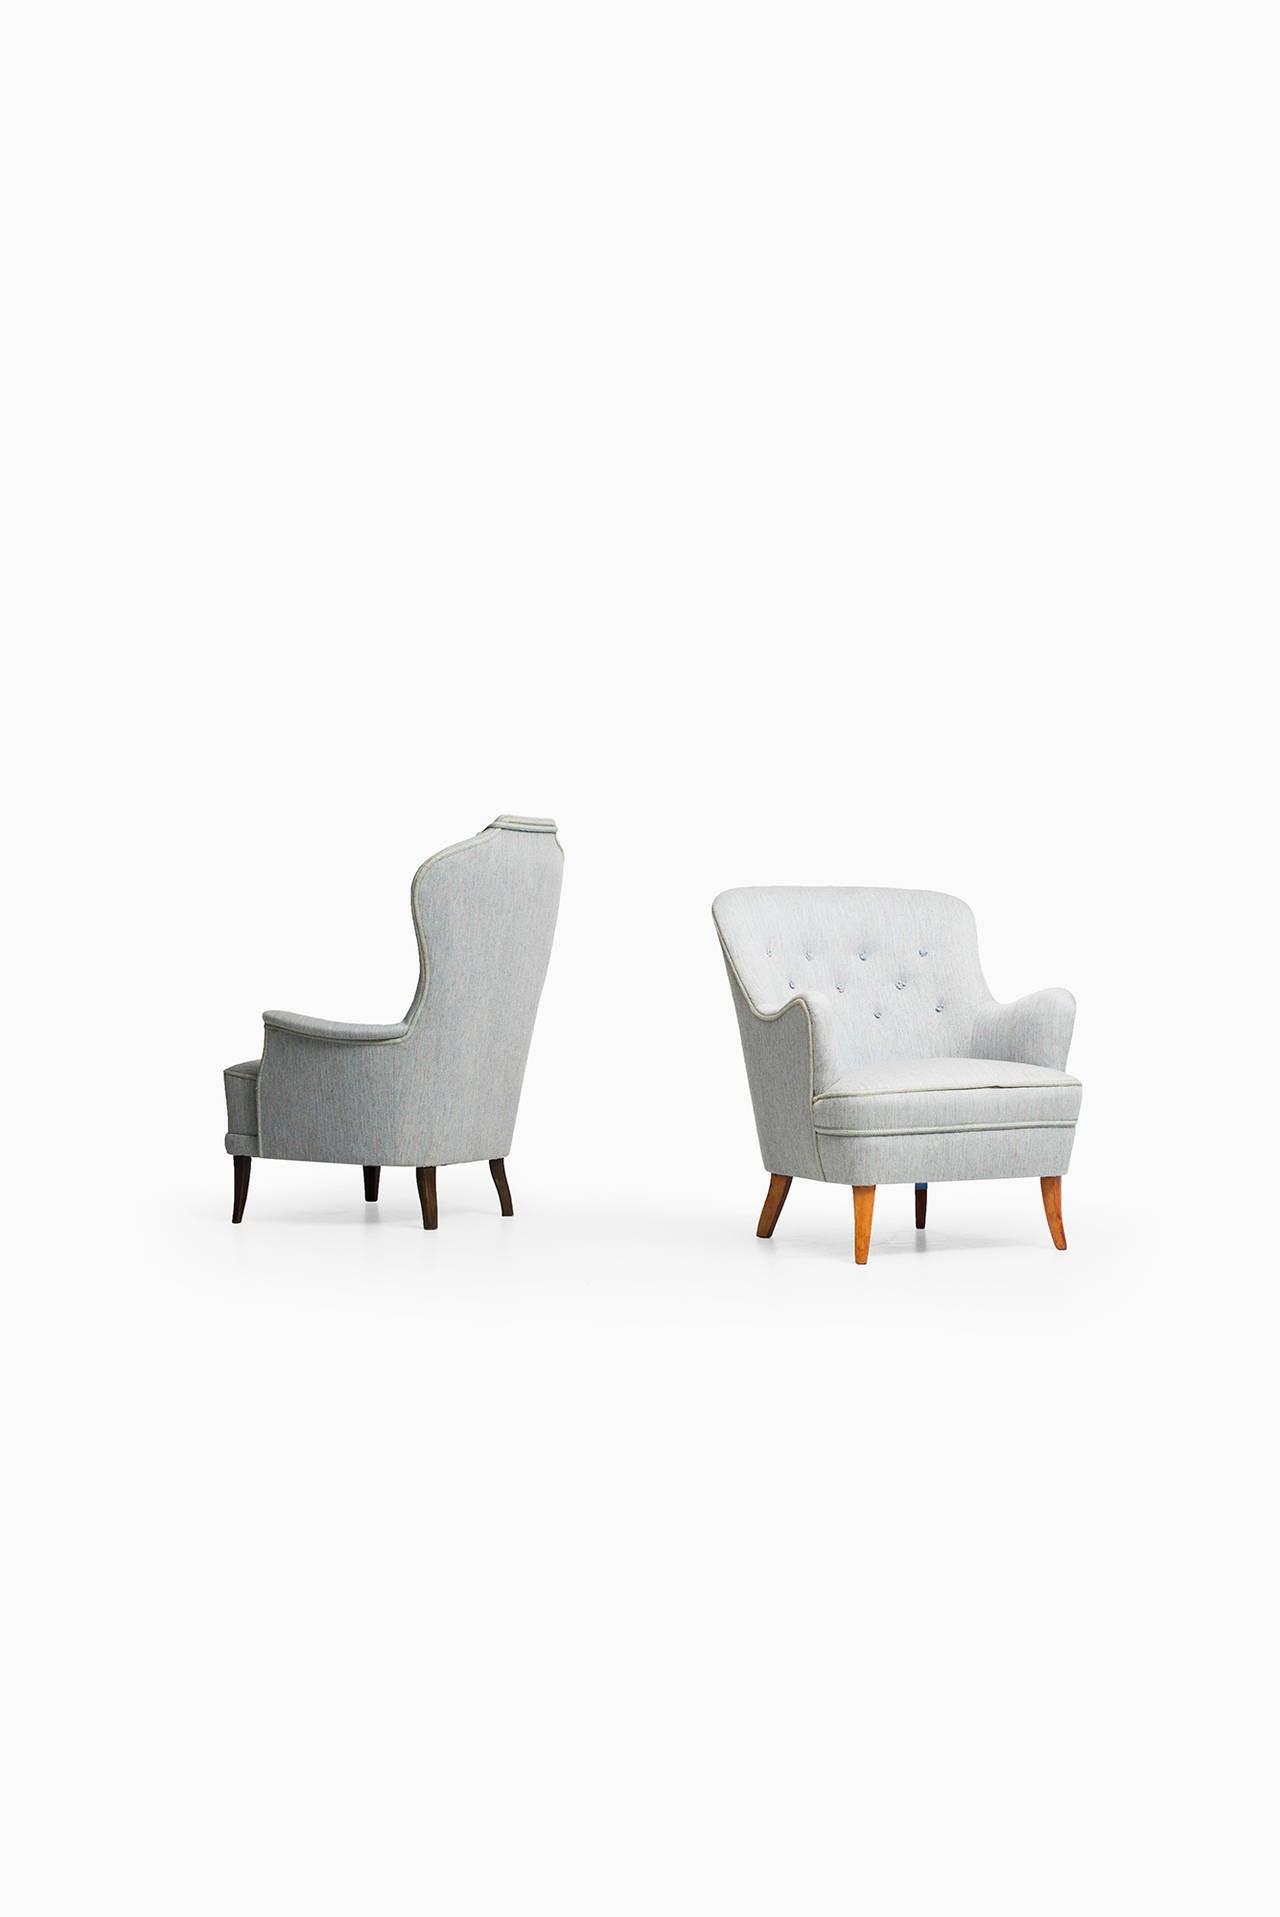 Carl Malmsten Easy Chair by O.H Sjögren in Sweden For Sale 2